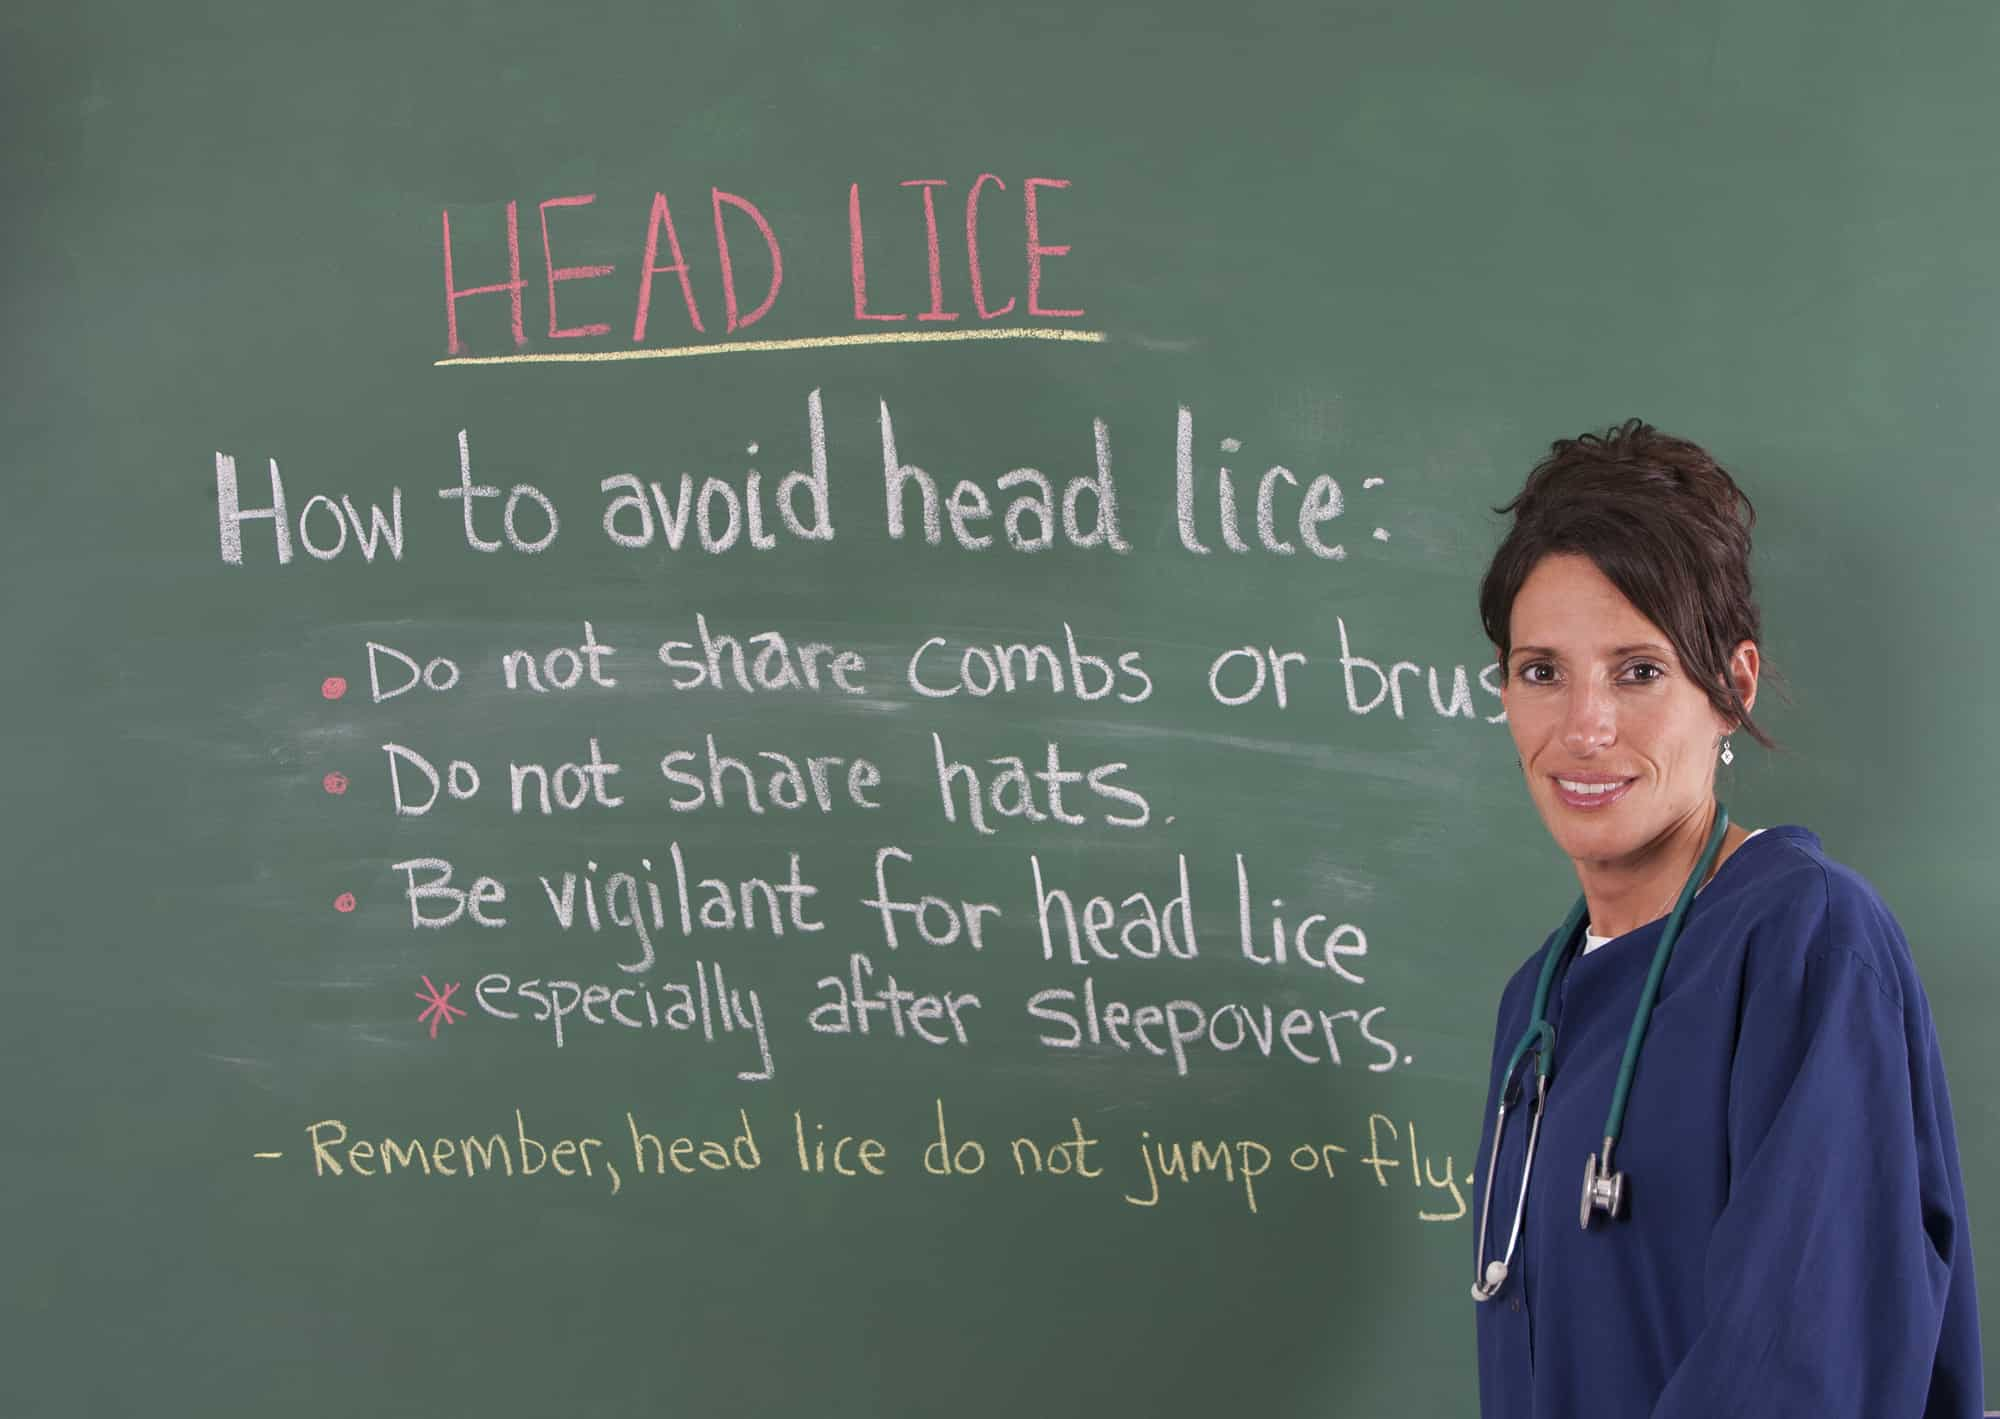 School nurse teaching about head lice